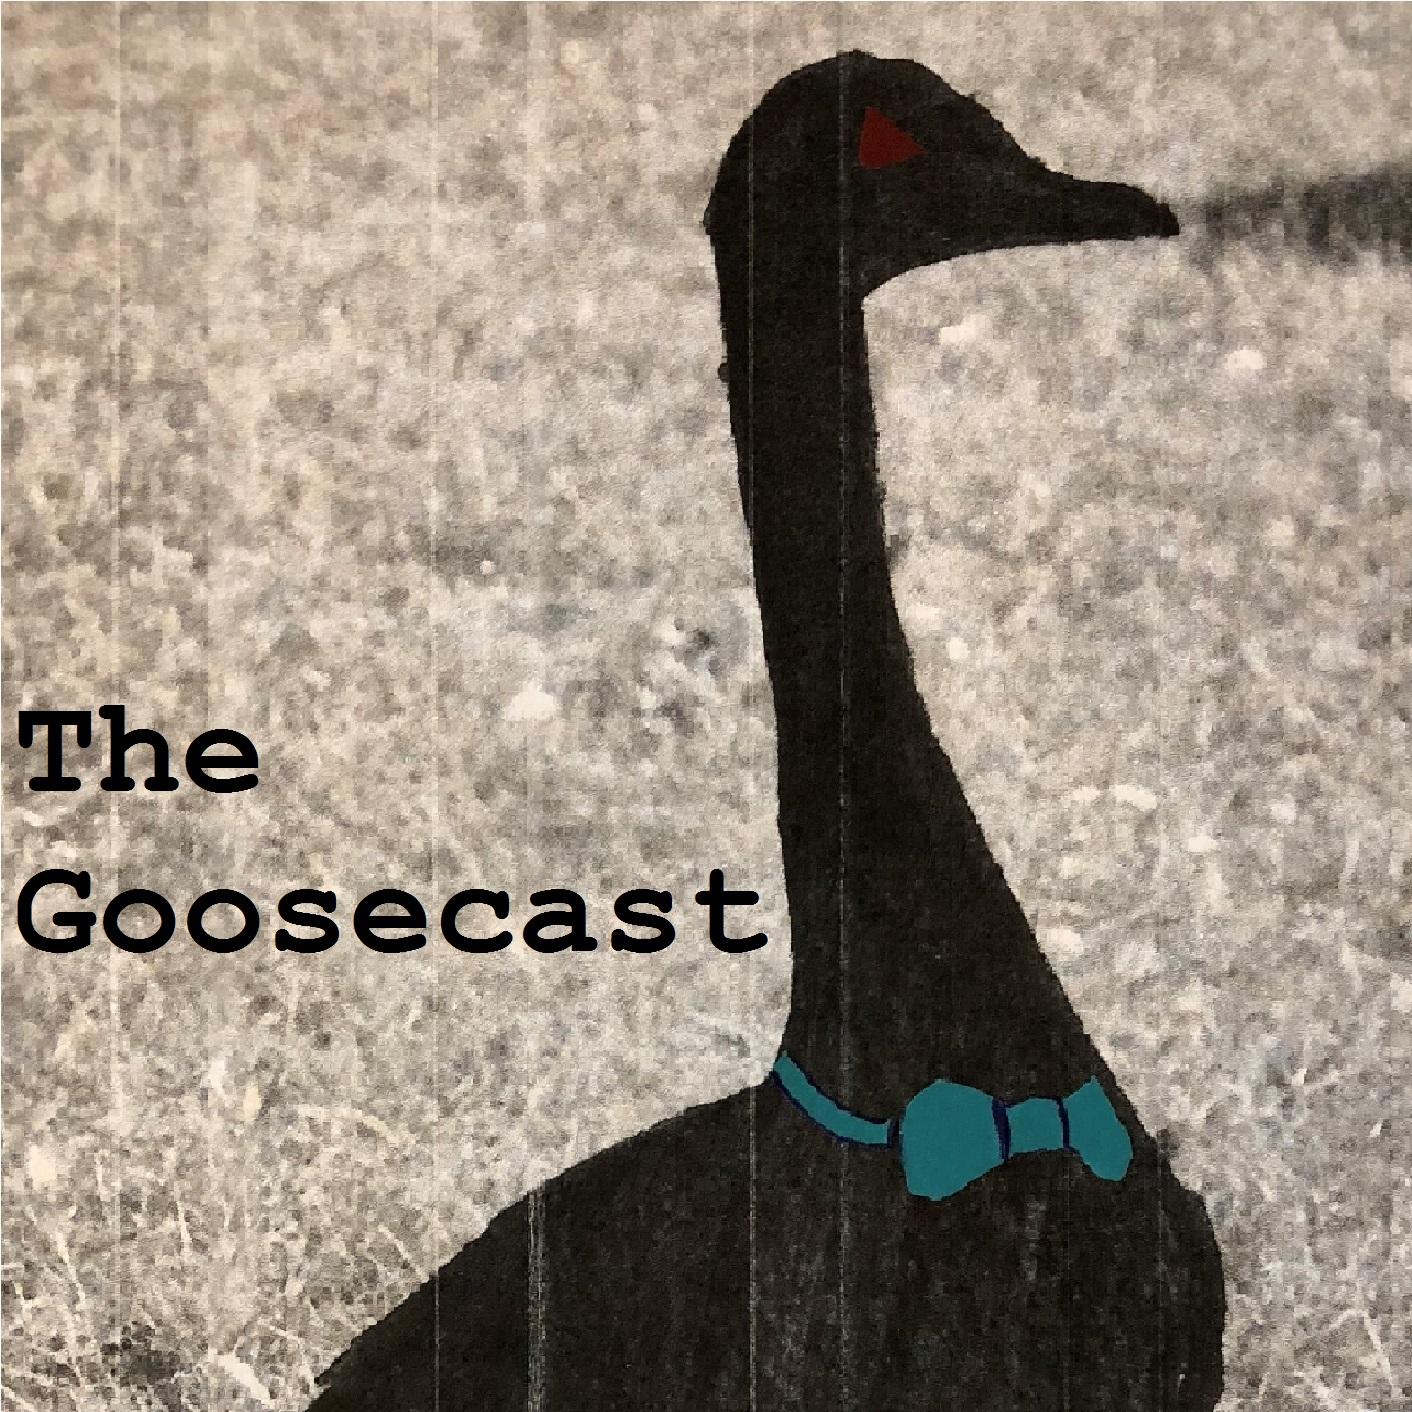 The Goosecast show art